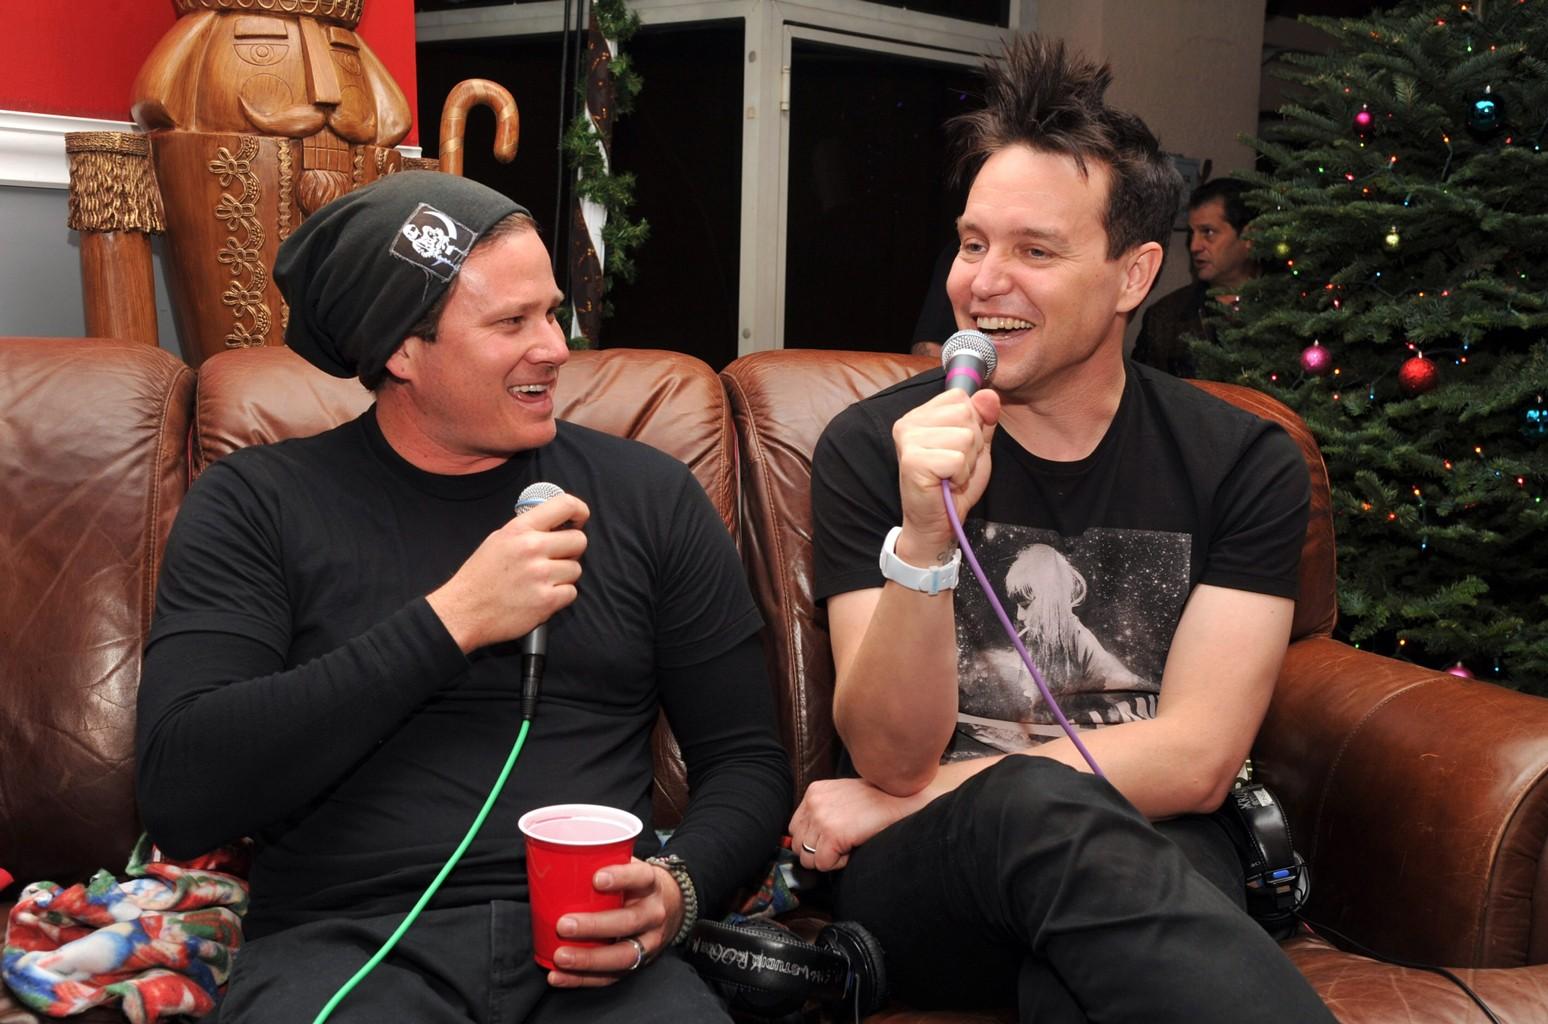 Tom DeLonge and Mark Hoppus